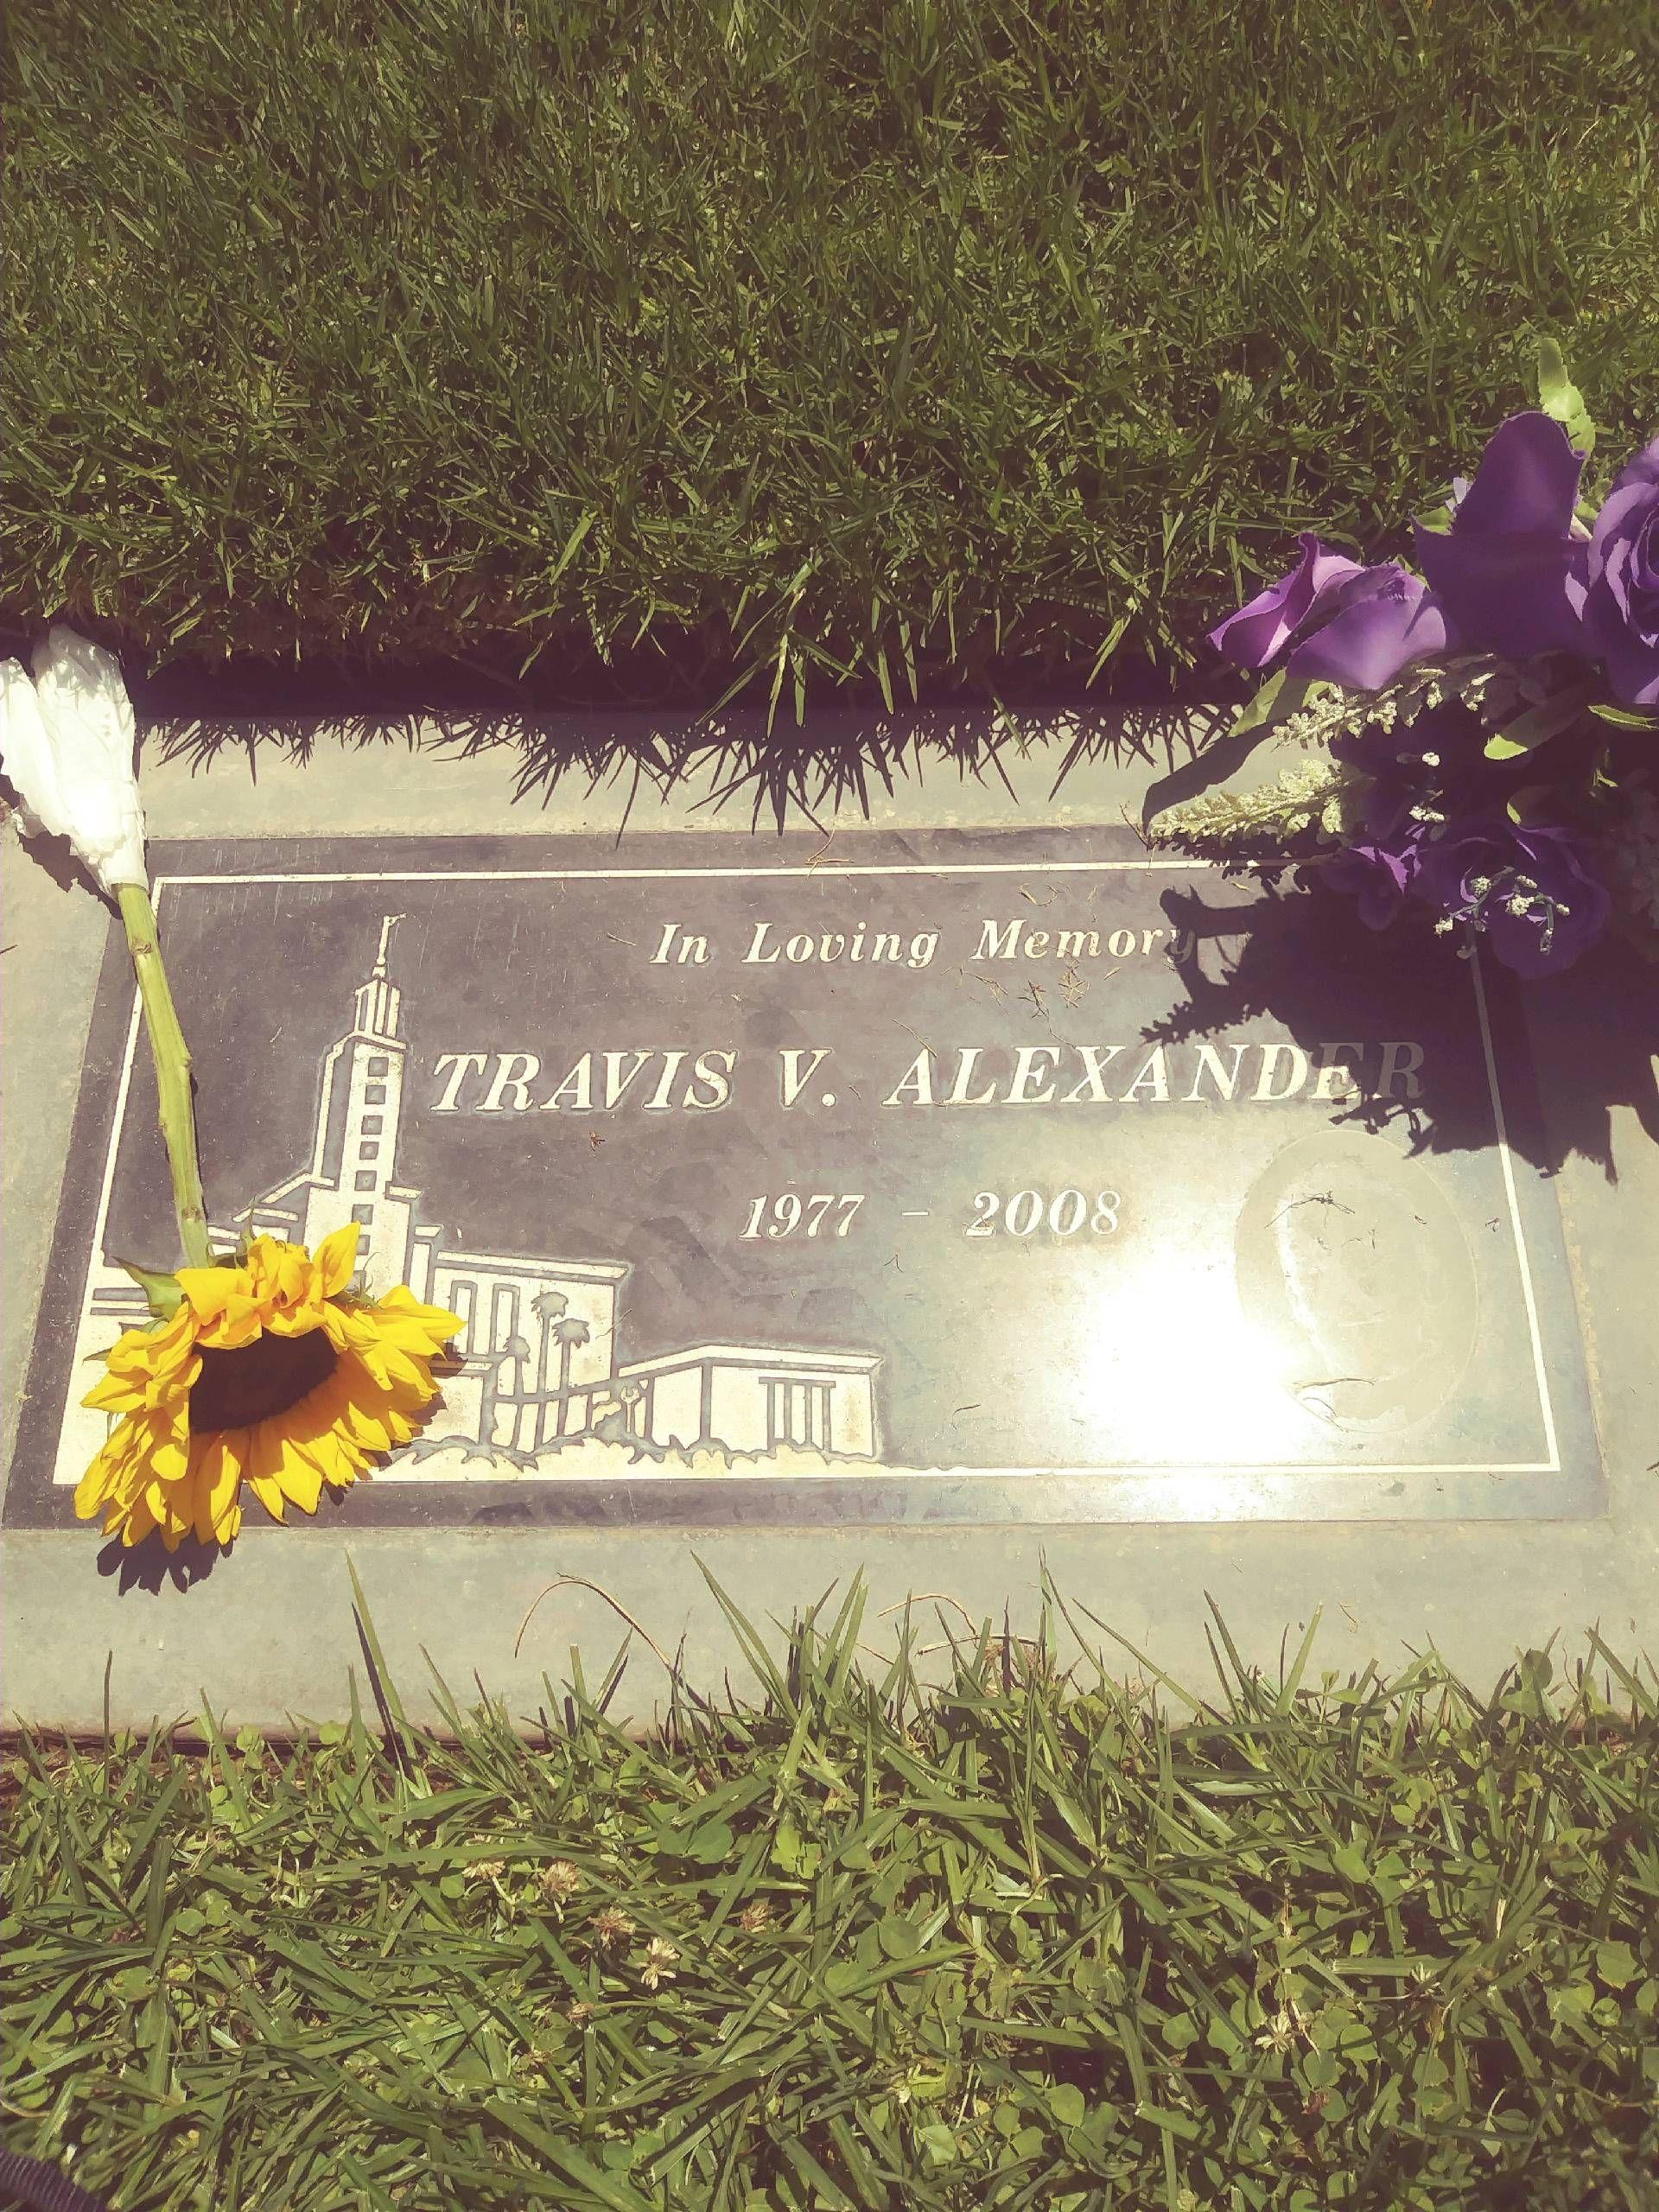 Travis Alexander Pictures : travis, alexander, pictures, Travis, Victor, Alexander, (1977-2008), Grave, Memorial